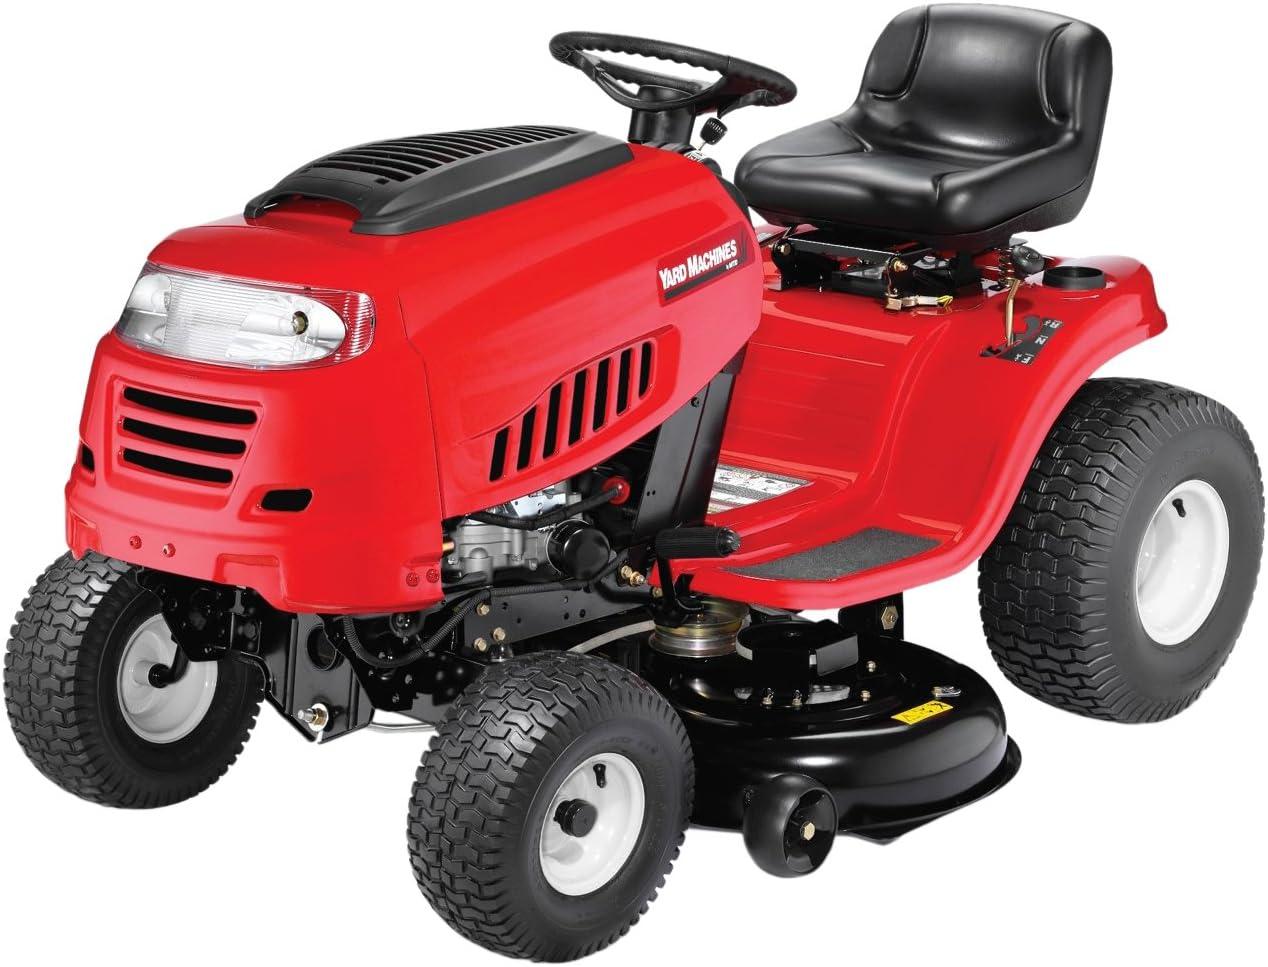 Yard Machines 420cc Riding Lawn Tractor